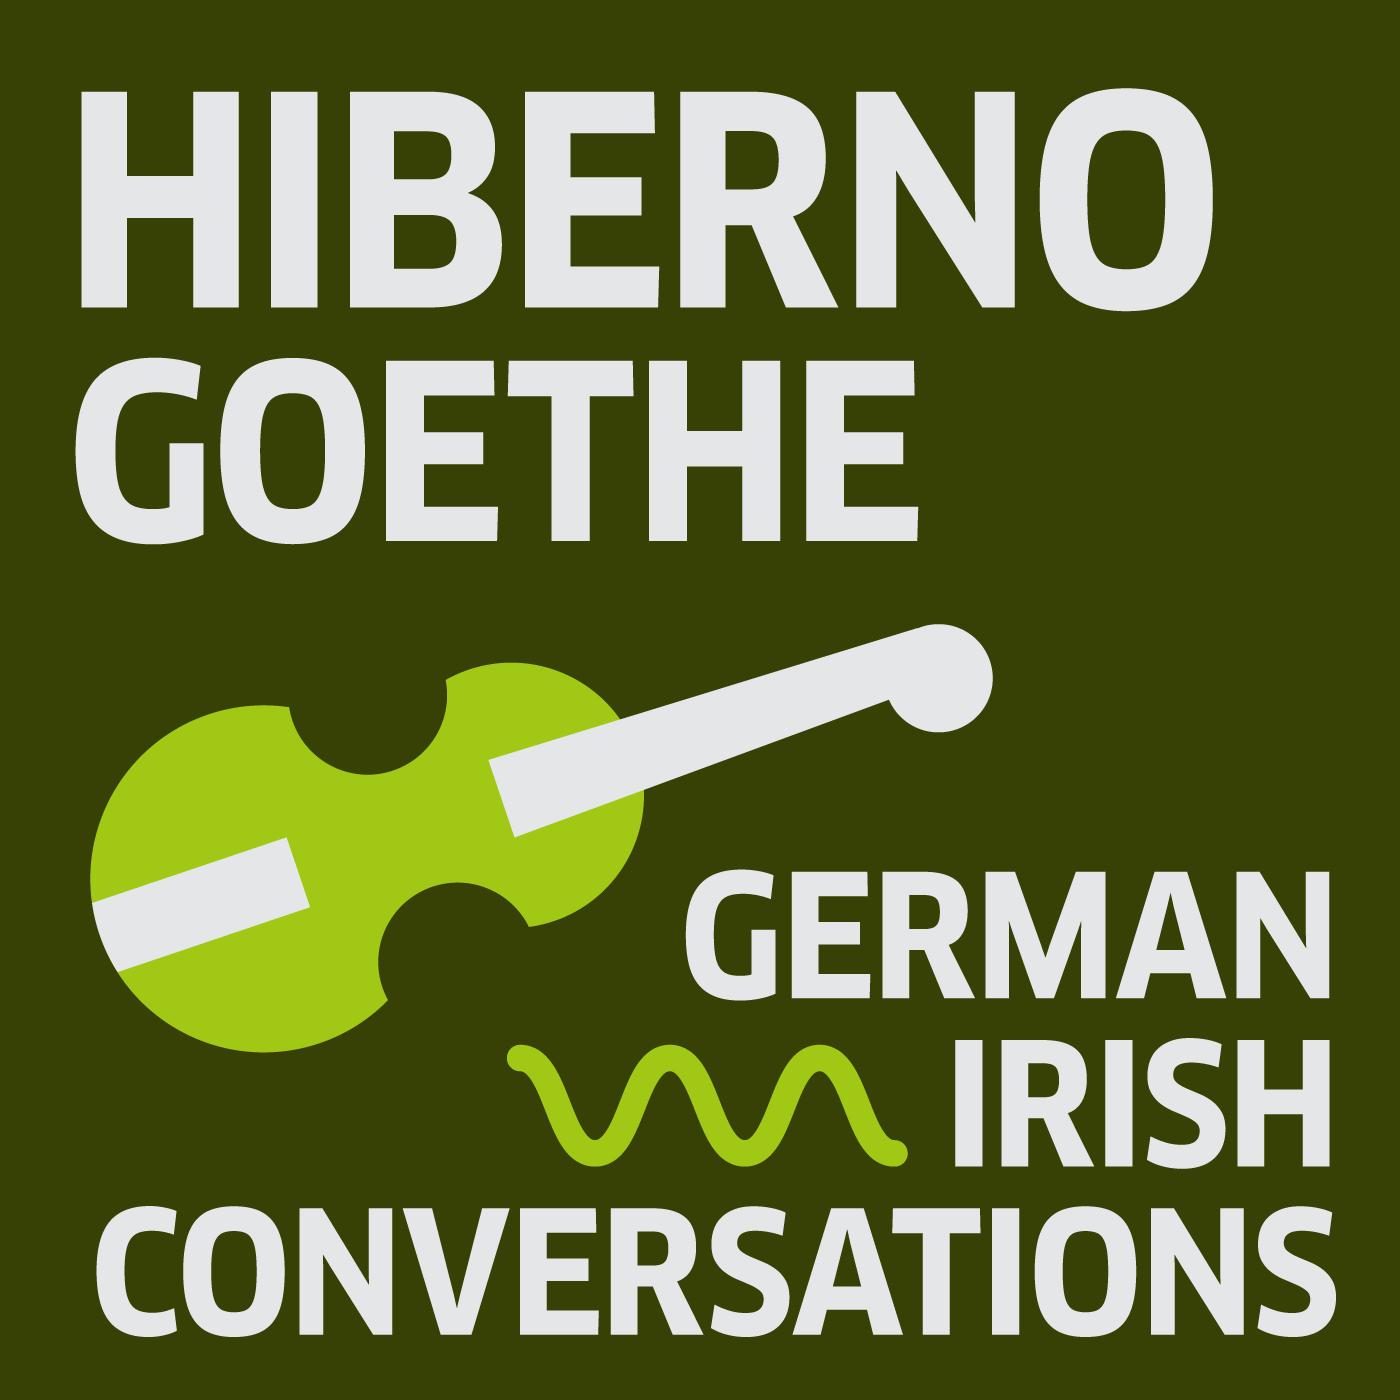 Hiberno Goethe: German Irish Conversations